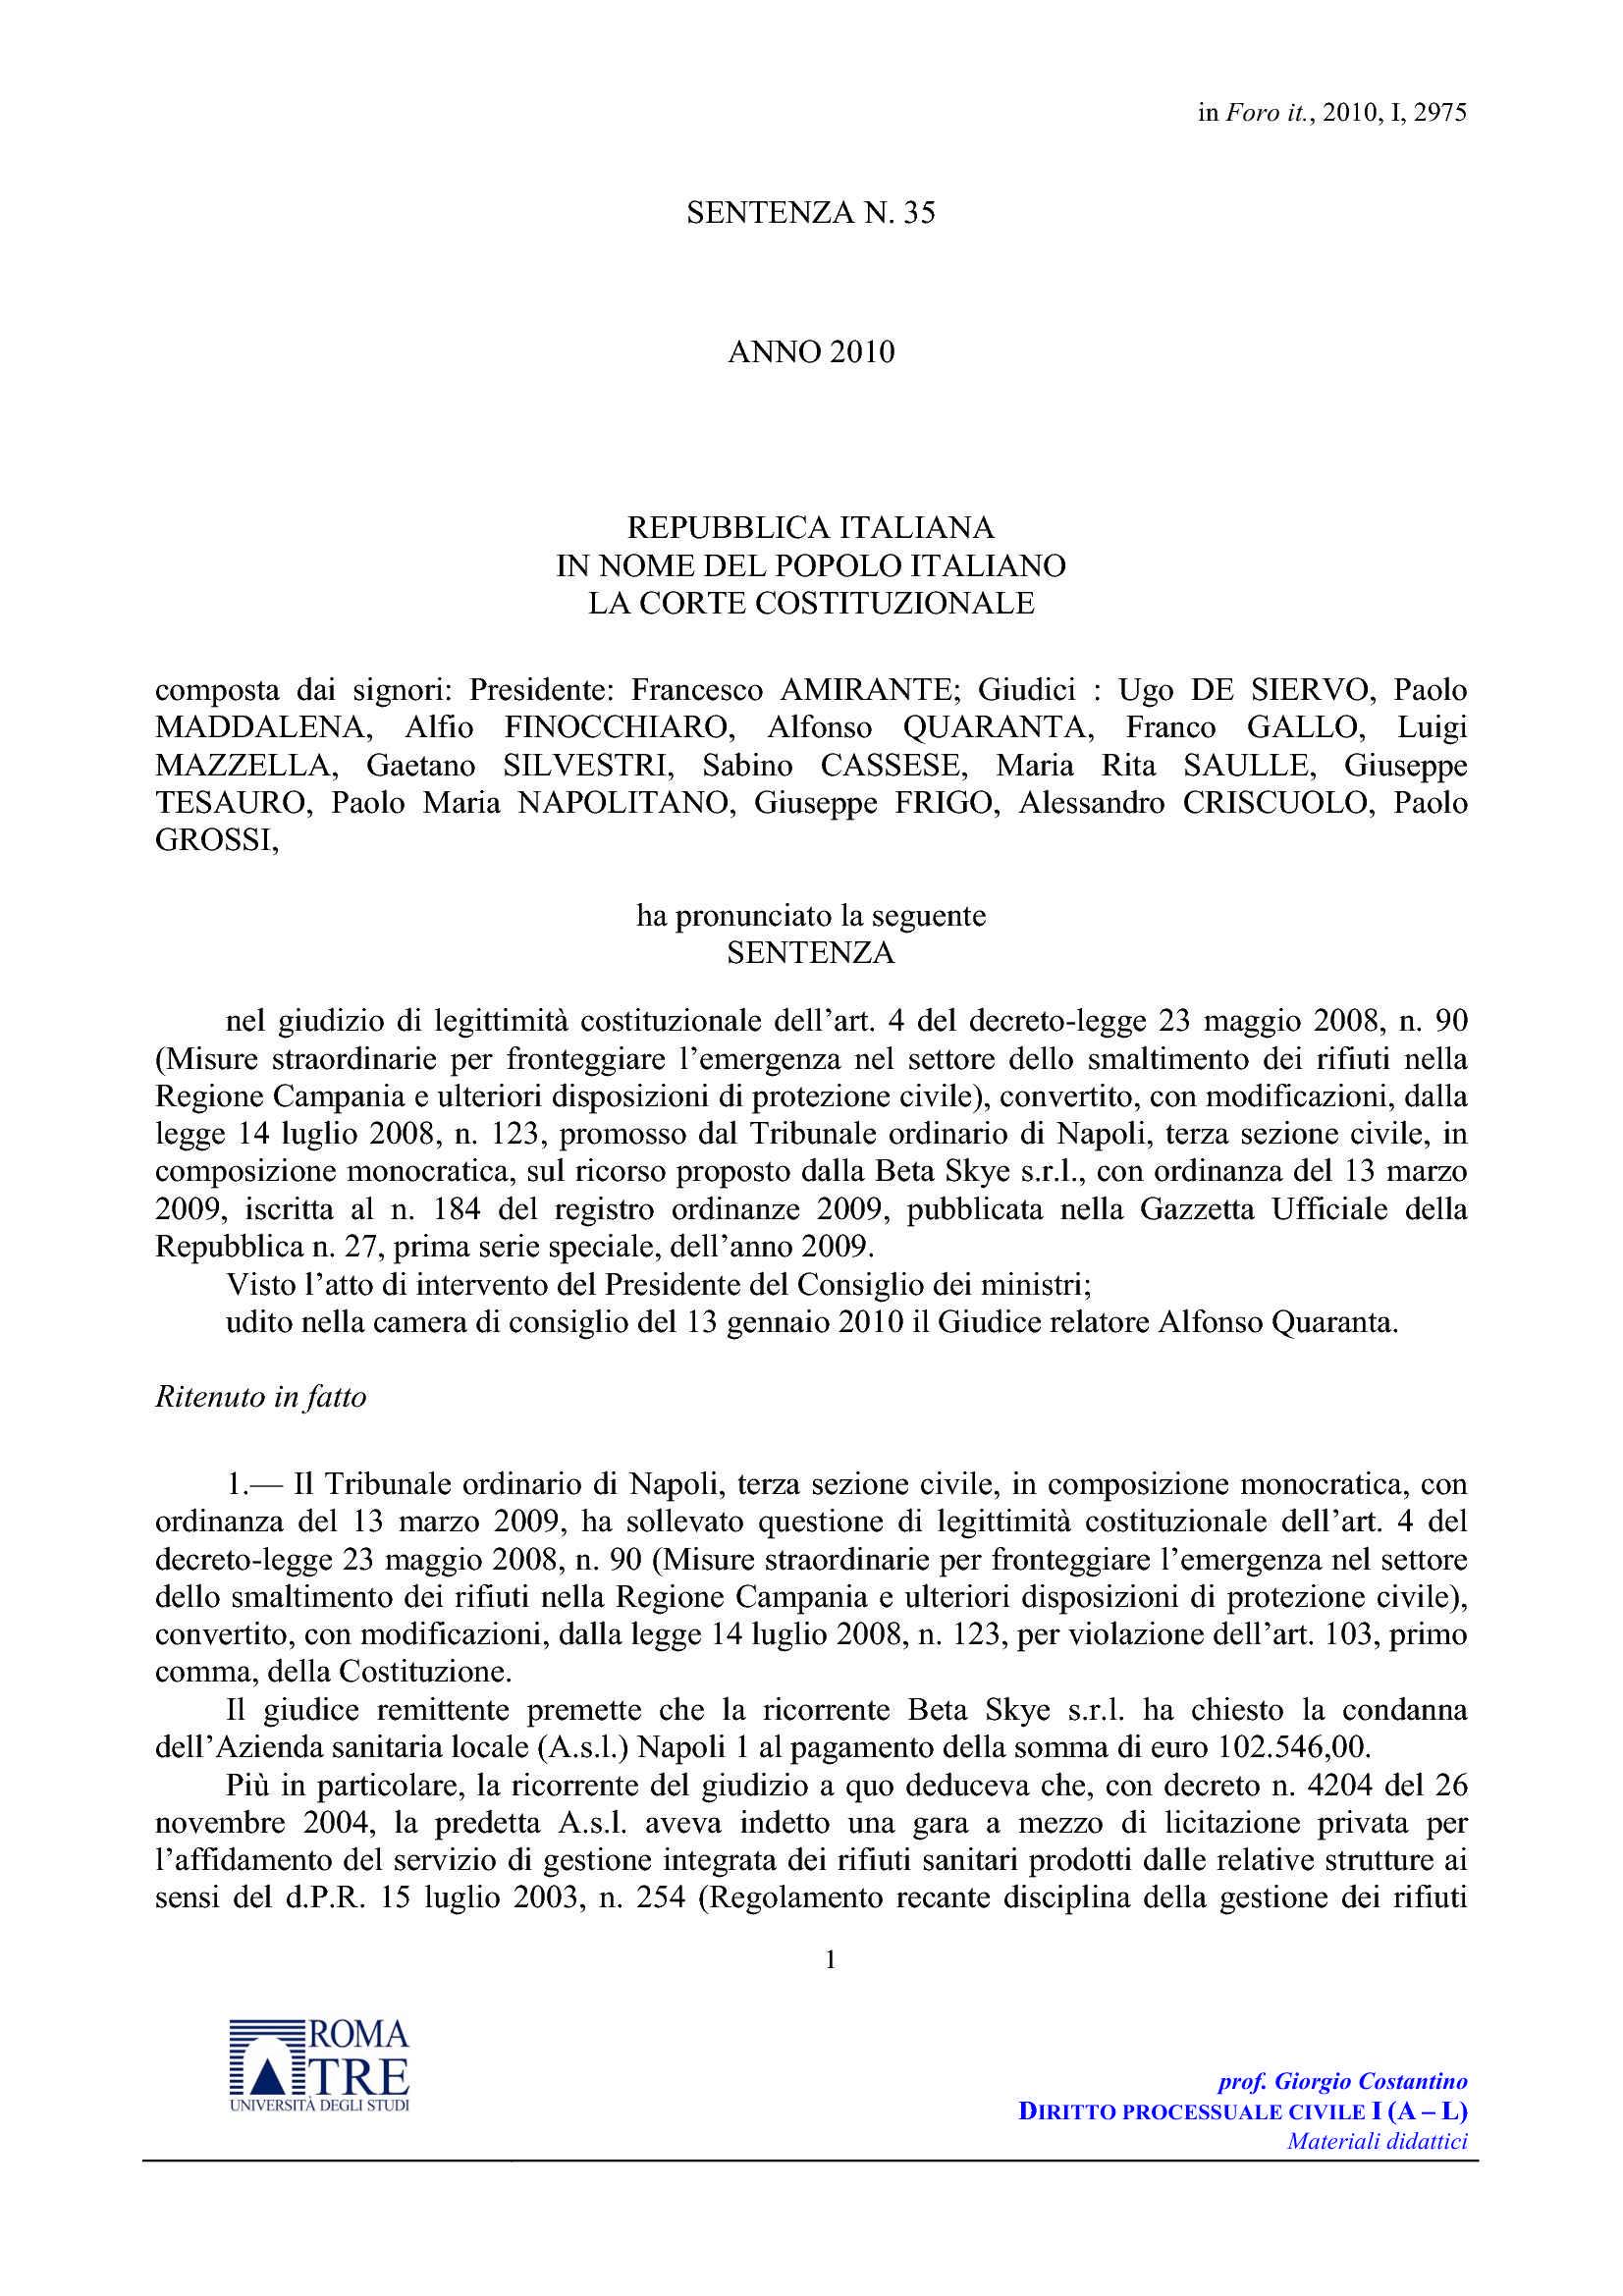 Gestione rifiuti - C. Cost. n. 35/10